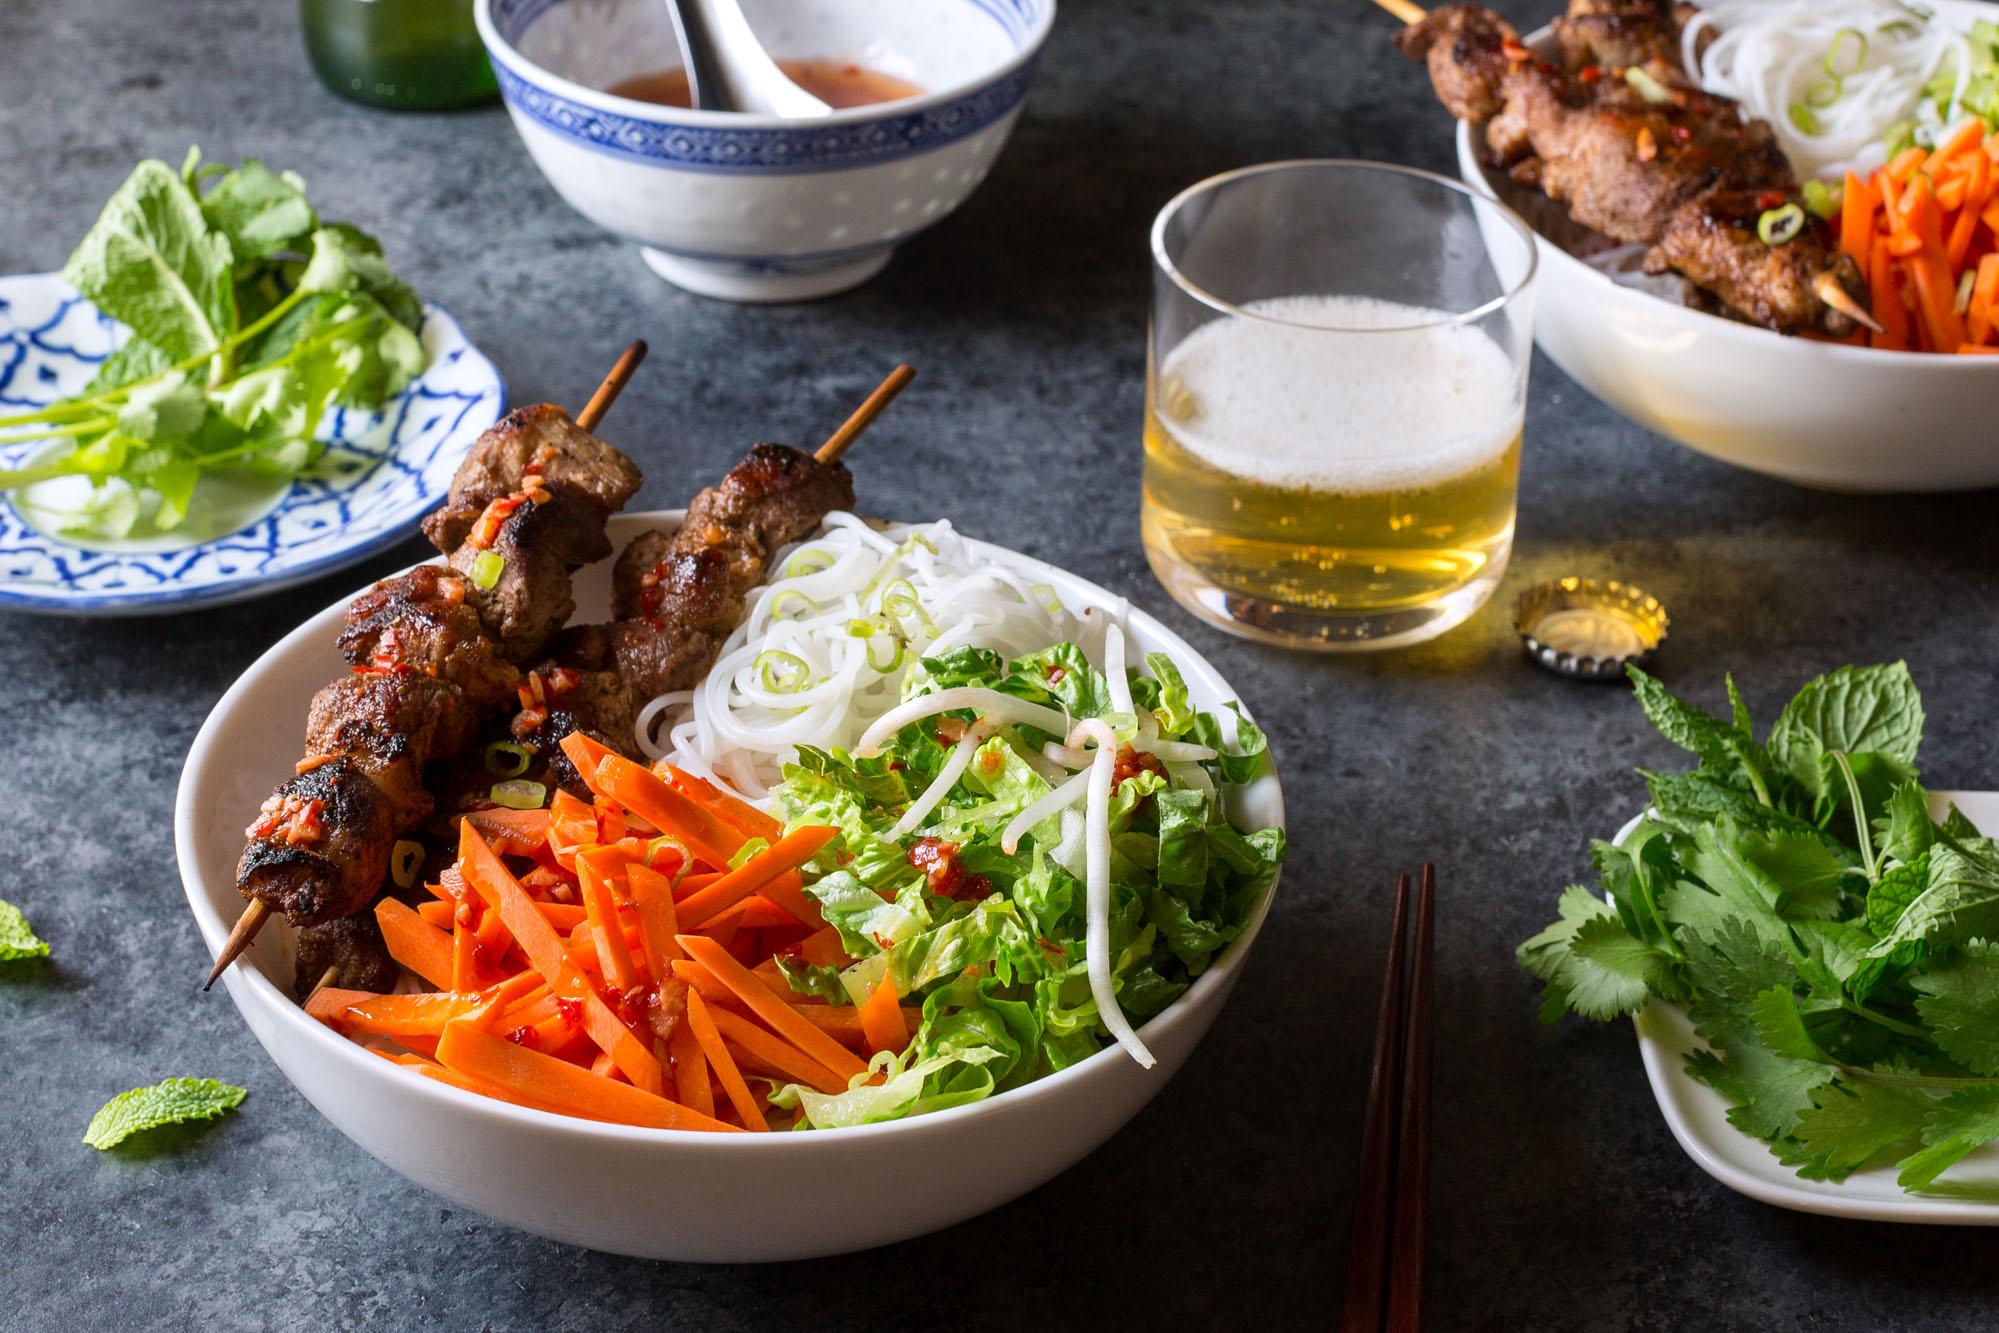 P092_Hanoi Bun Cha Five-Spice Pork Rice Noodles Fresh Herbs_Menu-Page.jpg